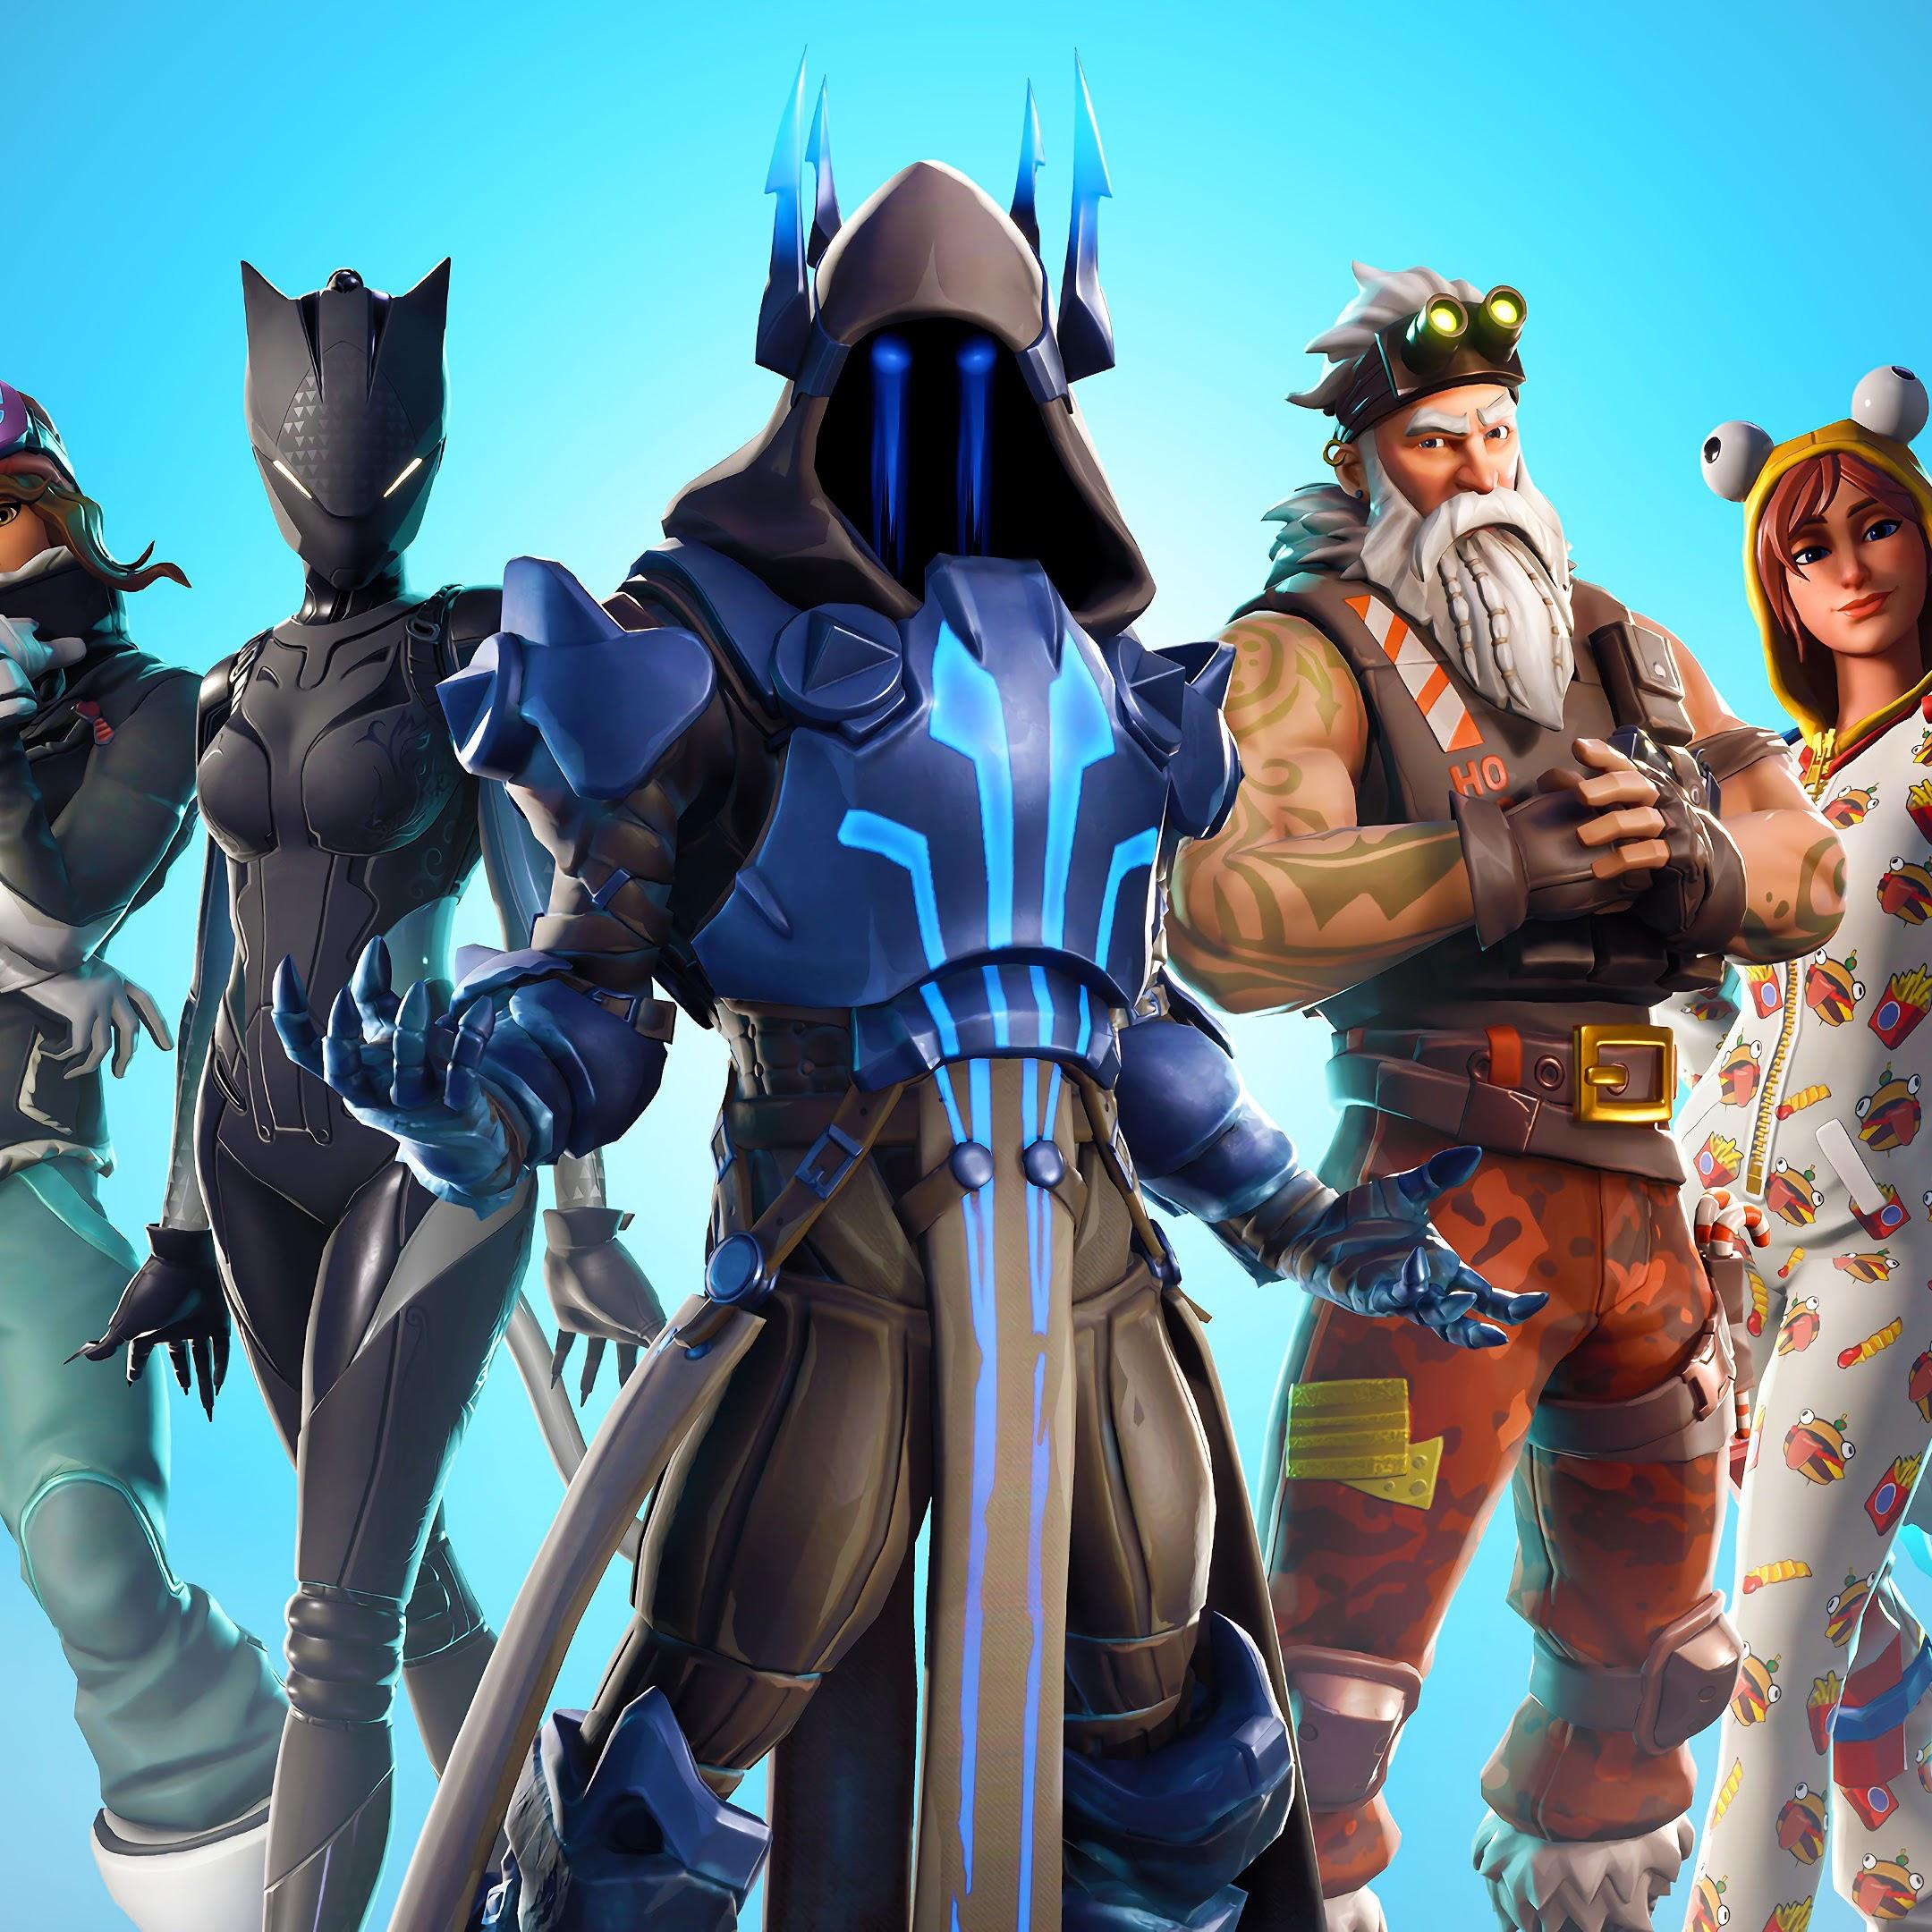 Fortnite Battle Royale, Season 7, Outfits, 4K, 3840x2160